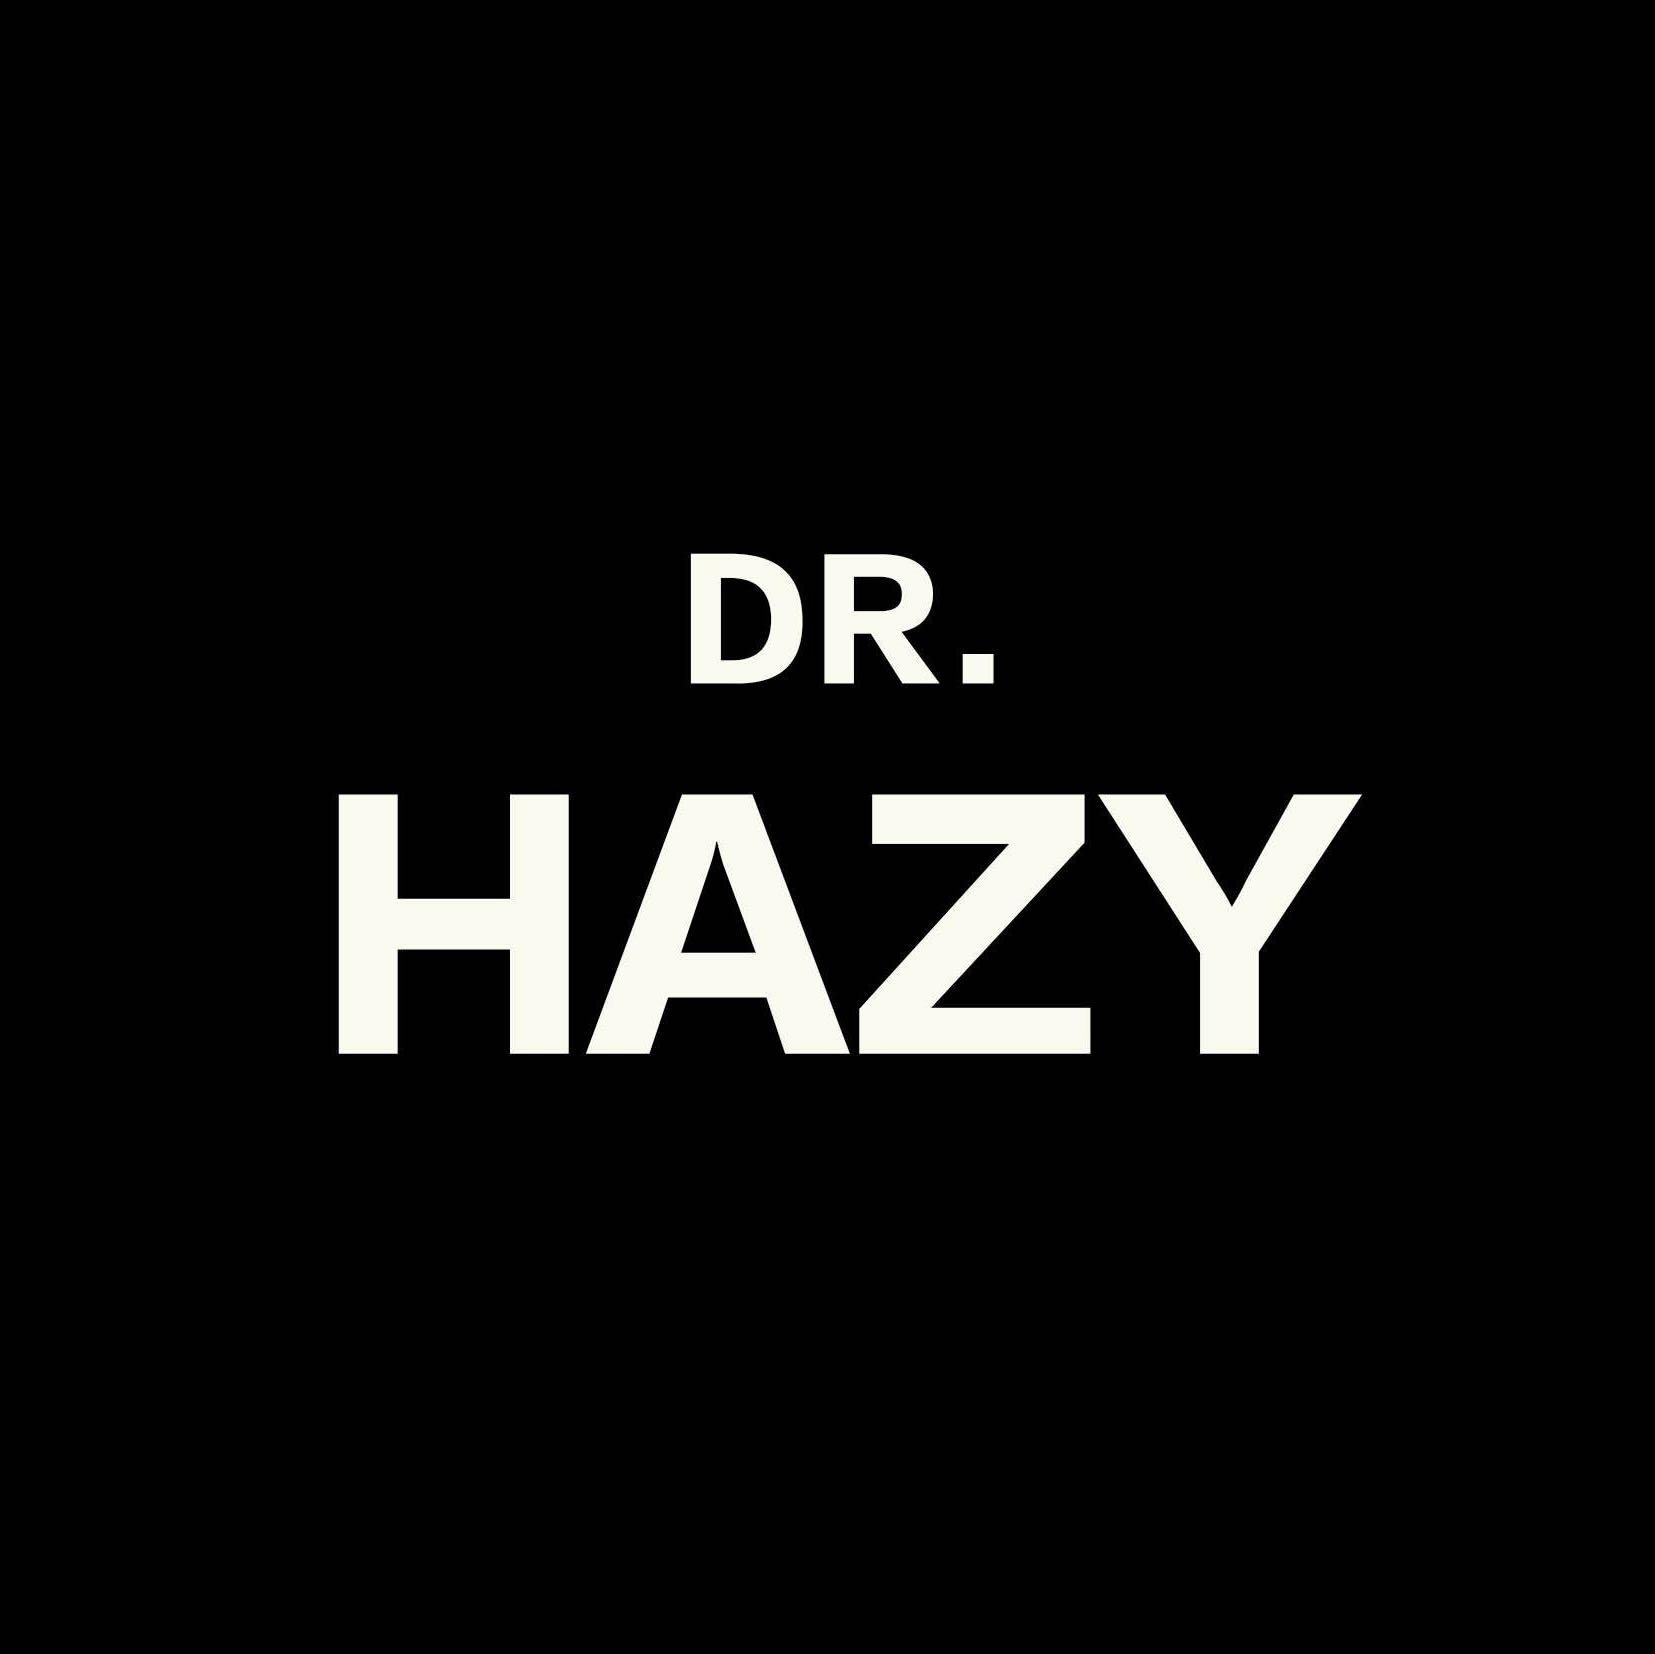 dr.hazy